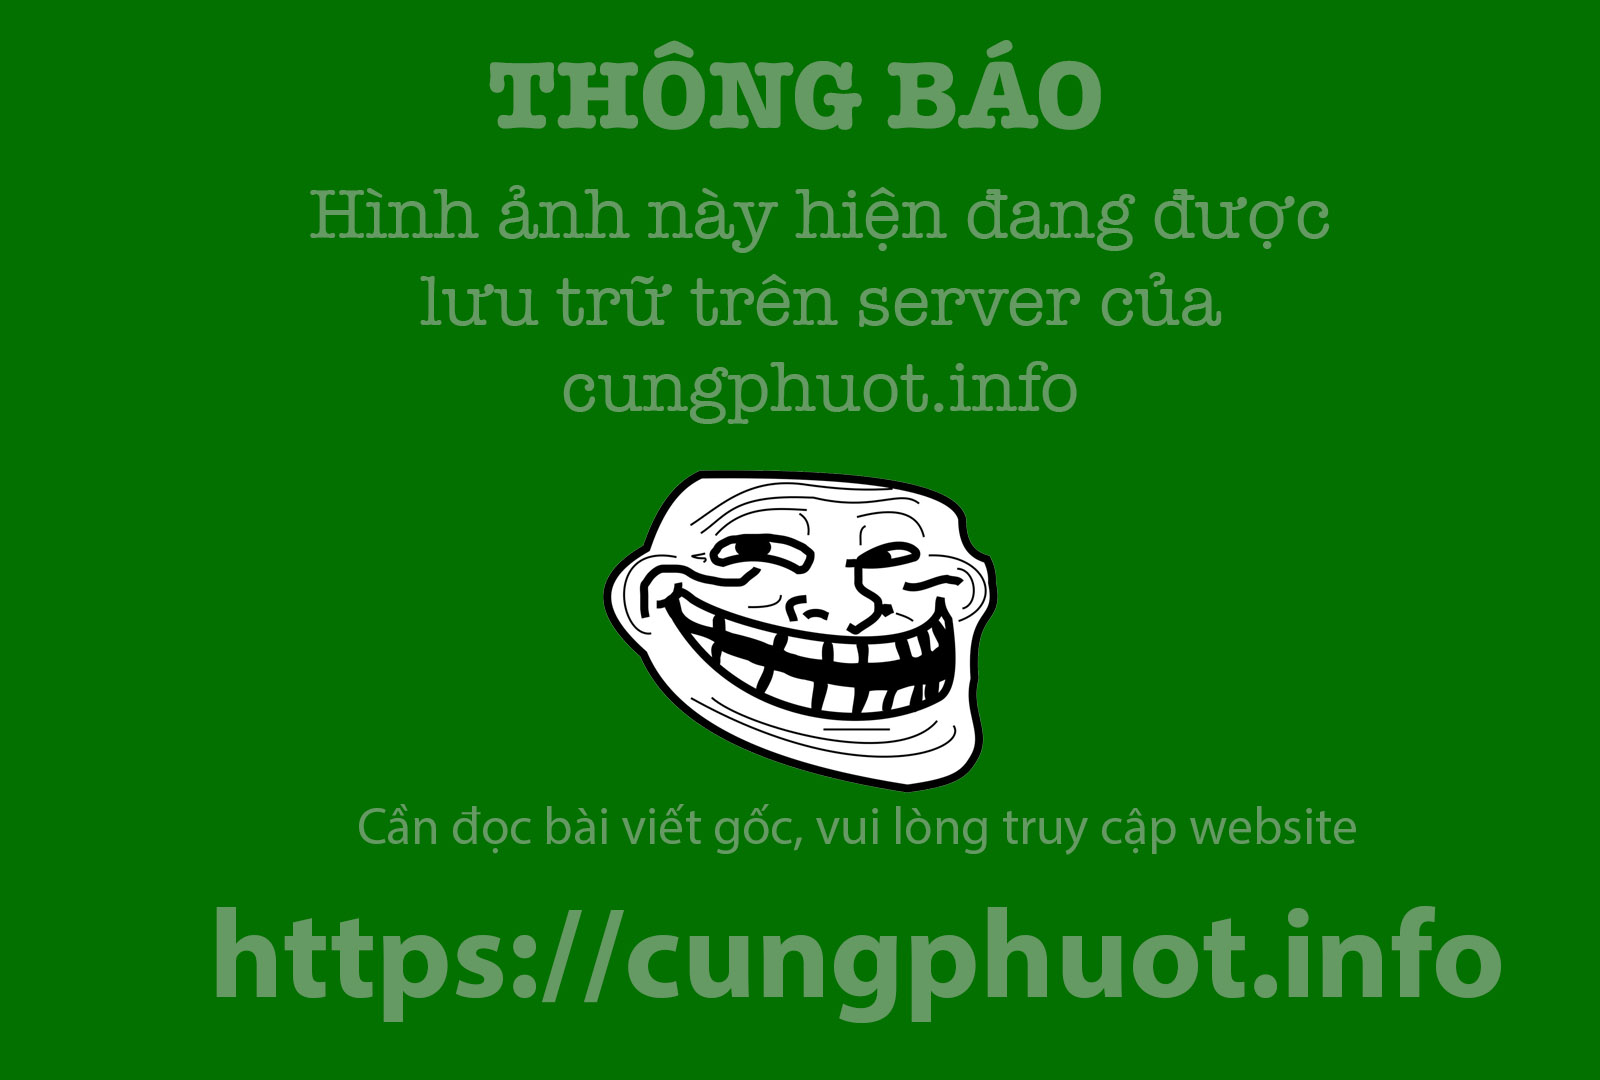 Buses to Mui Ne, Binh Thuan